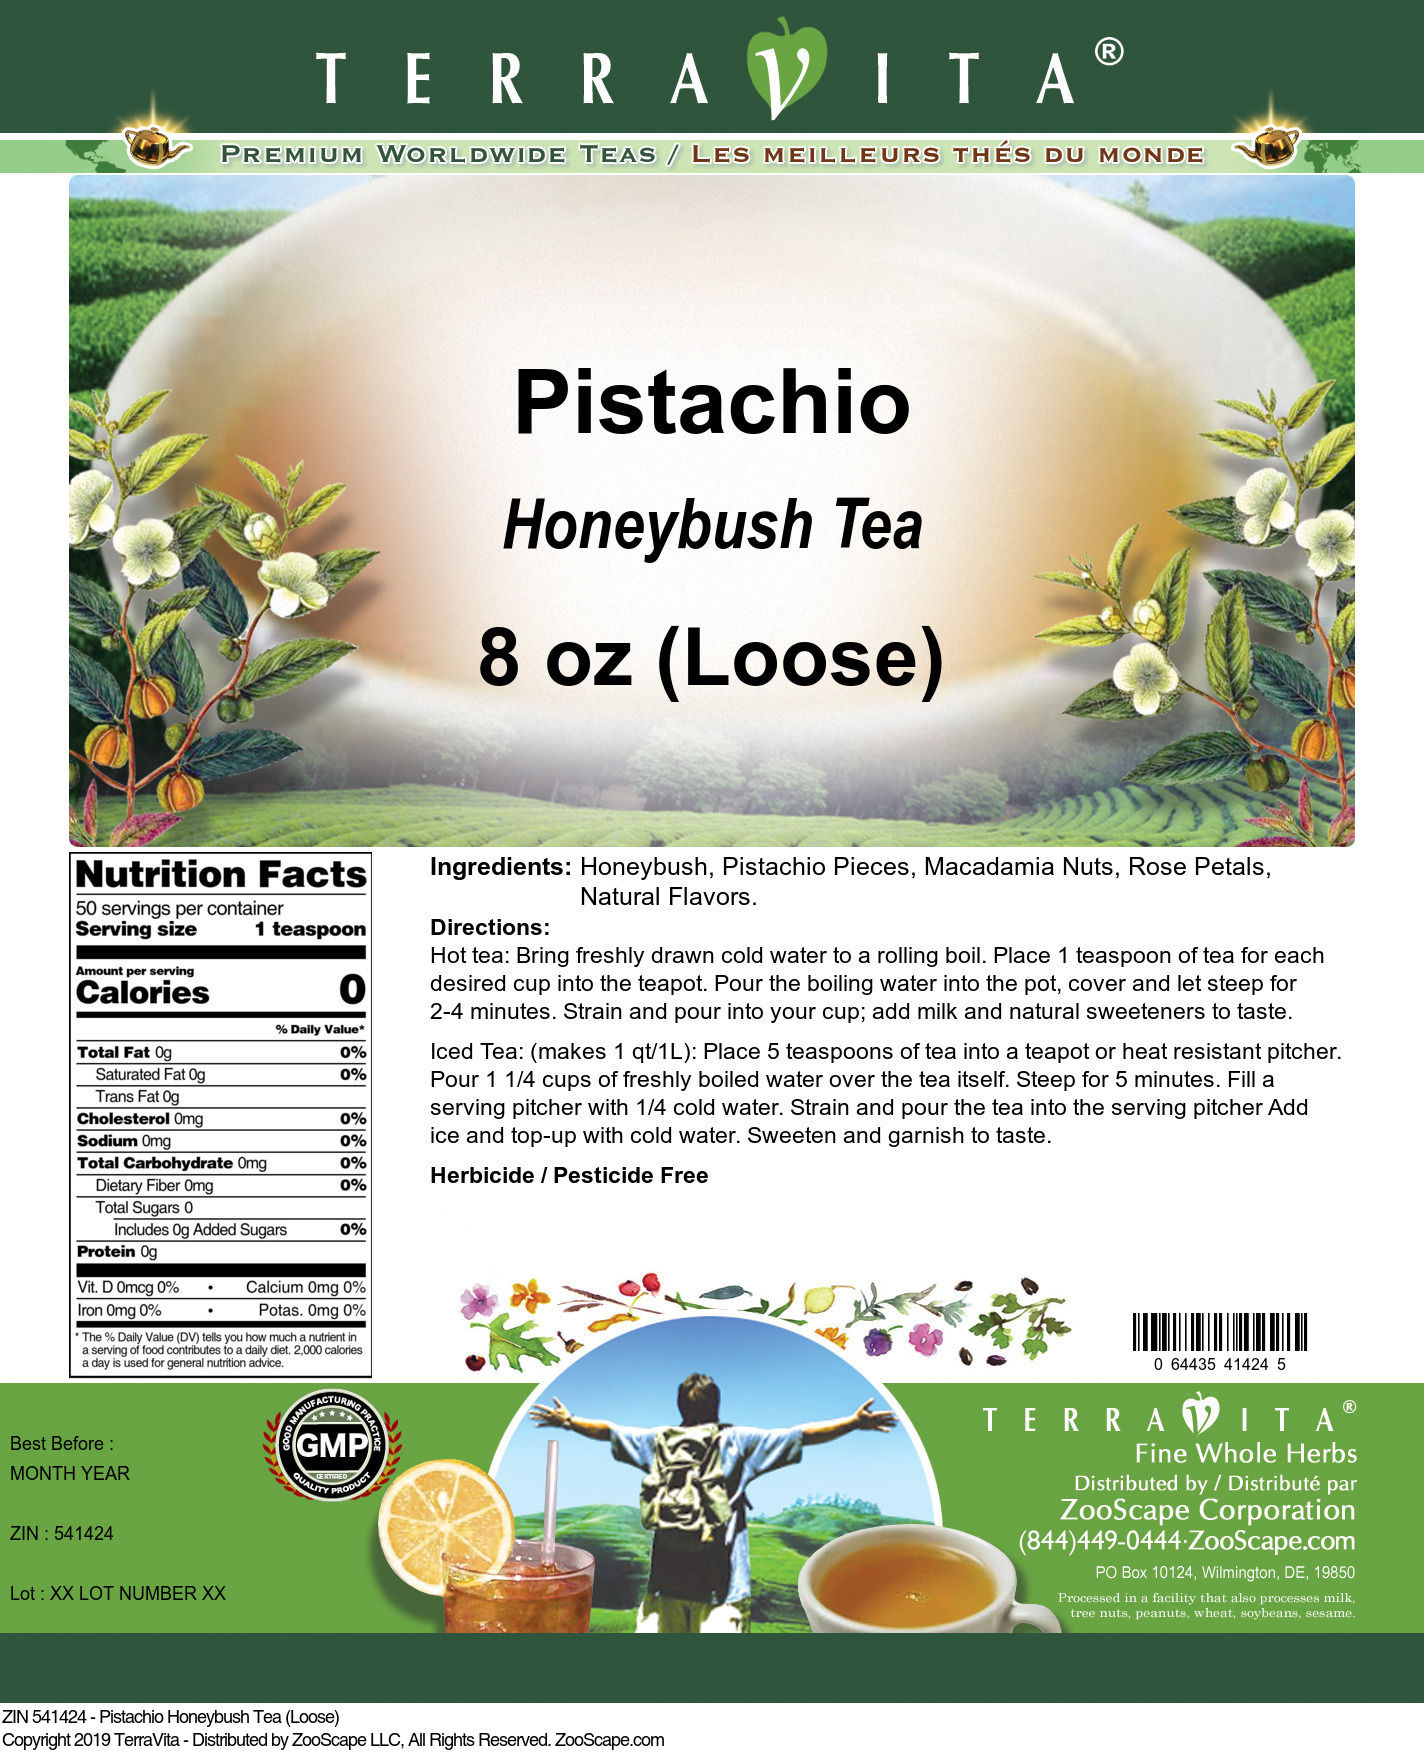 Pistachio Honeybush Tea